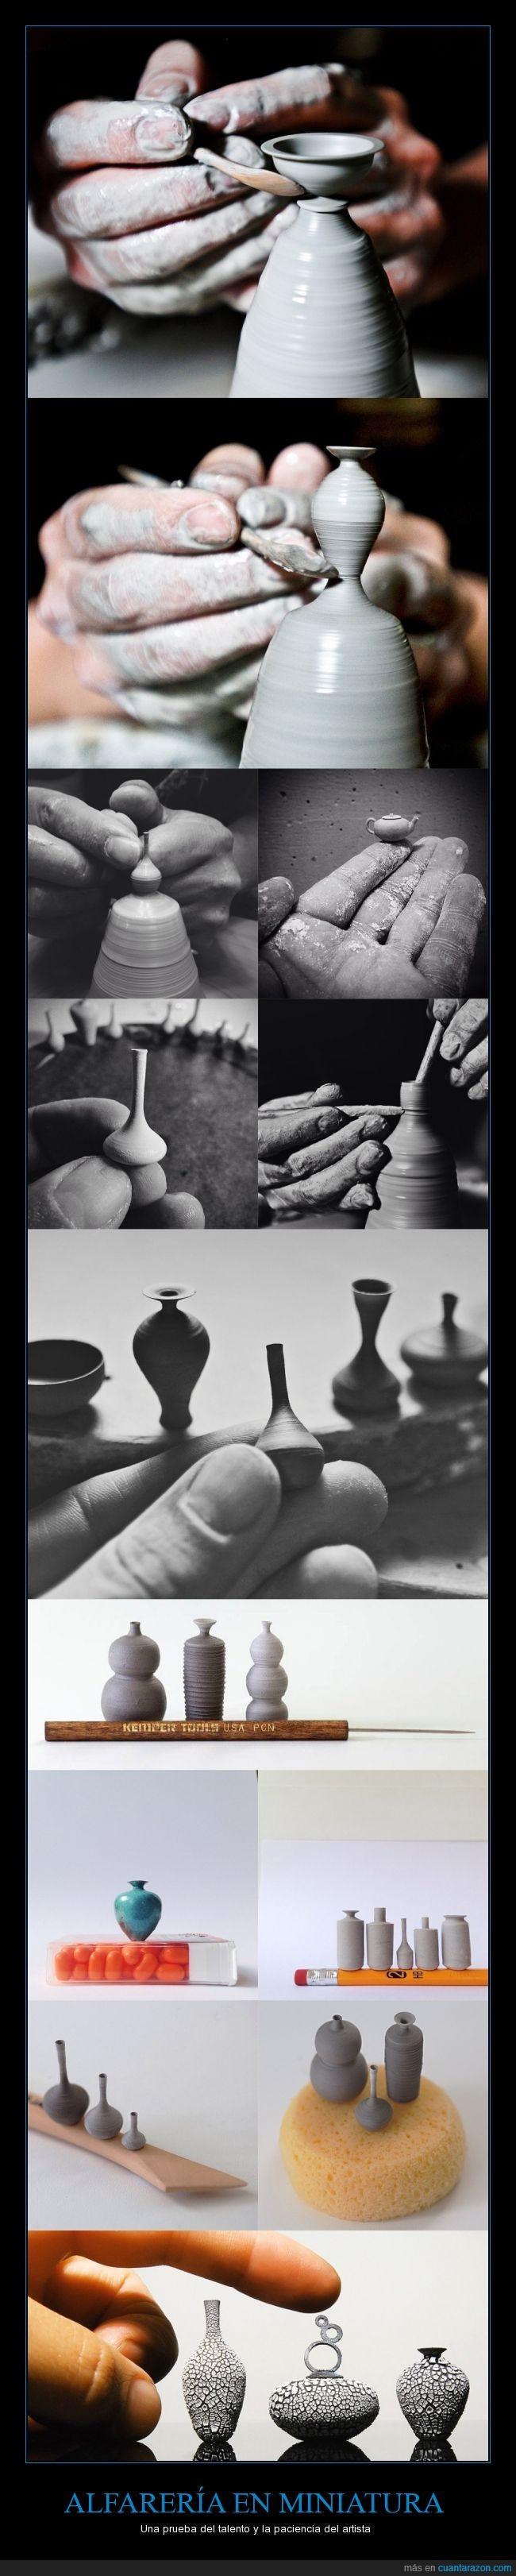 alfarería,artesanal,artista,buen pulso,frágil,Jon Almeda,miniatura,paciencia,precioso,talento,trabajo duro